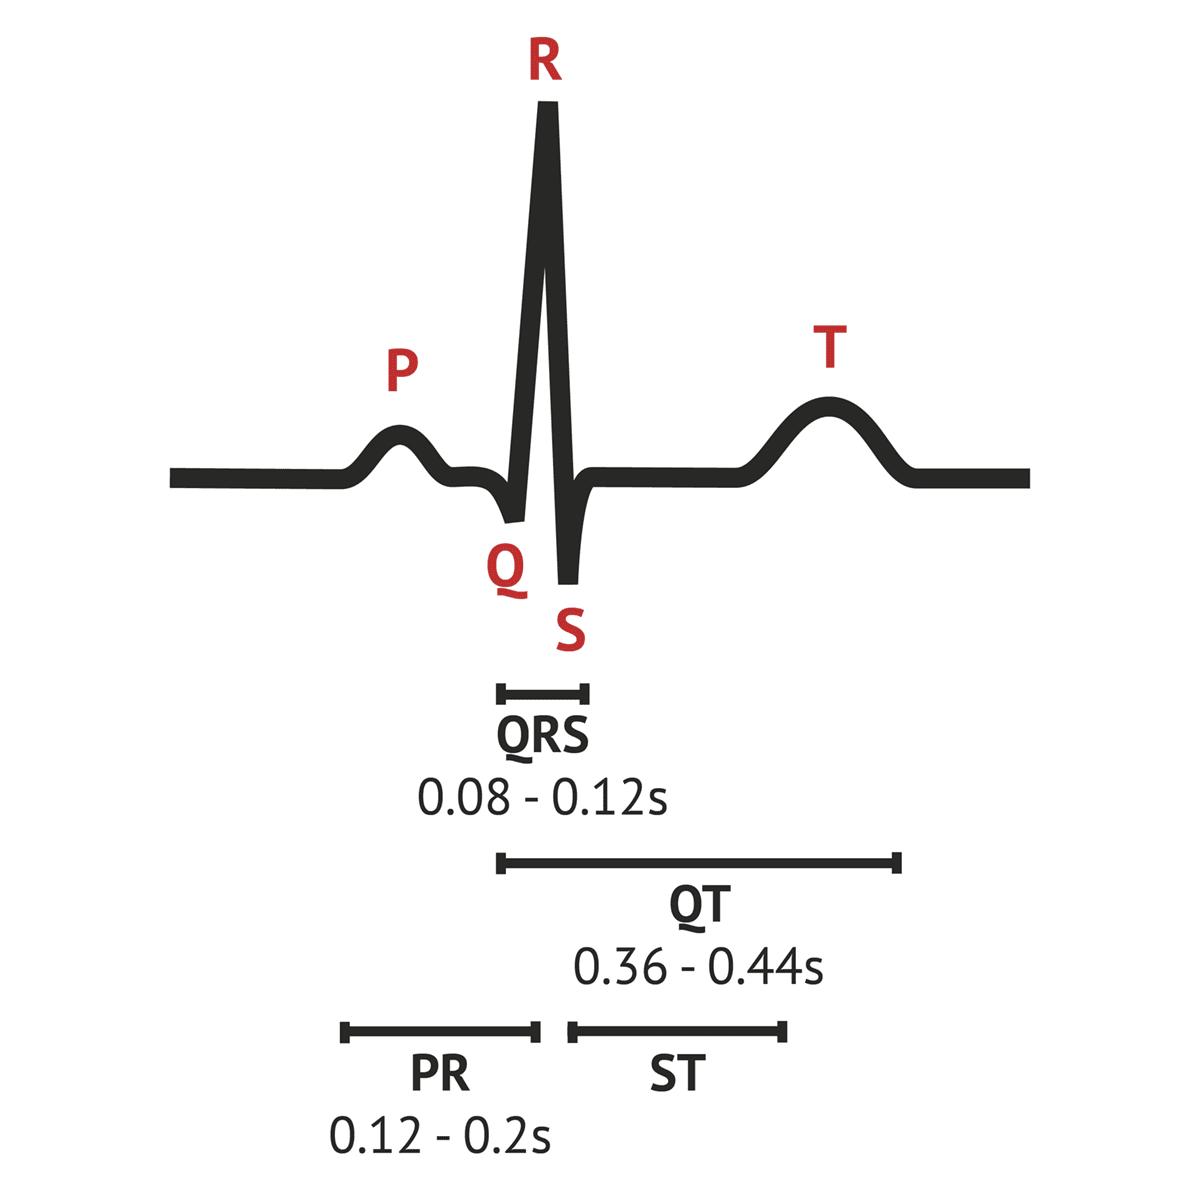 The Normal Ecg Trace Interpretation Medschool Electrocardiogram Diagram Electrocar Diogram